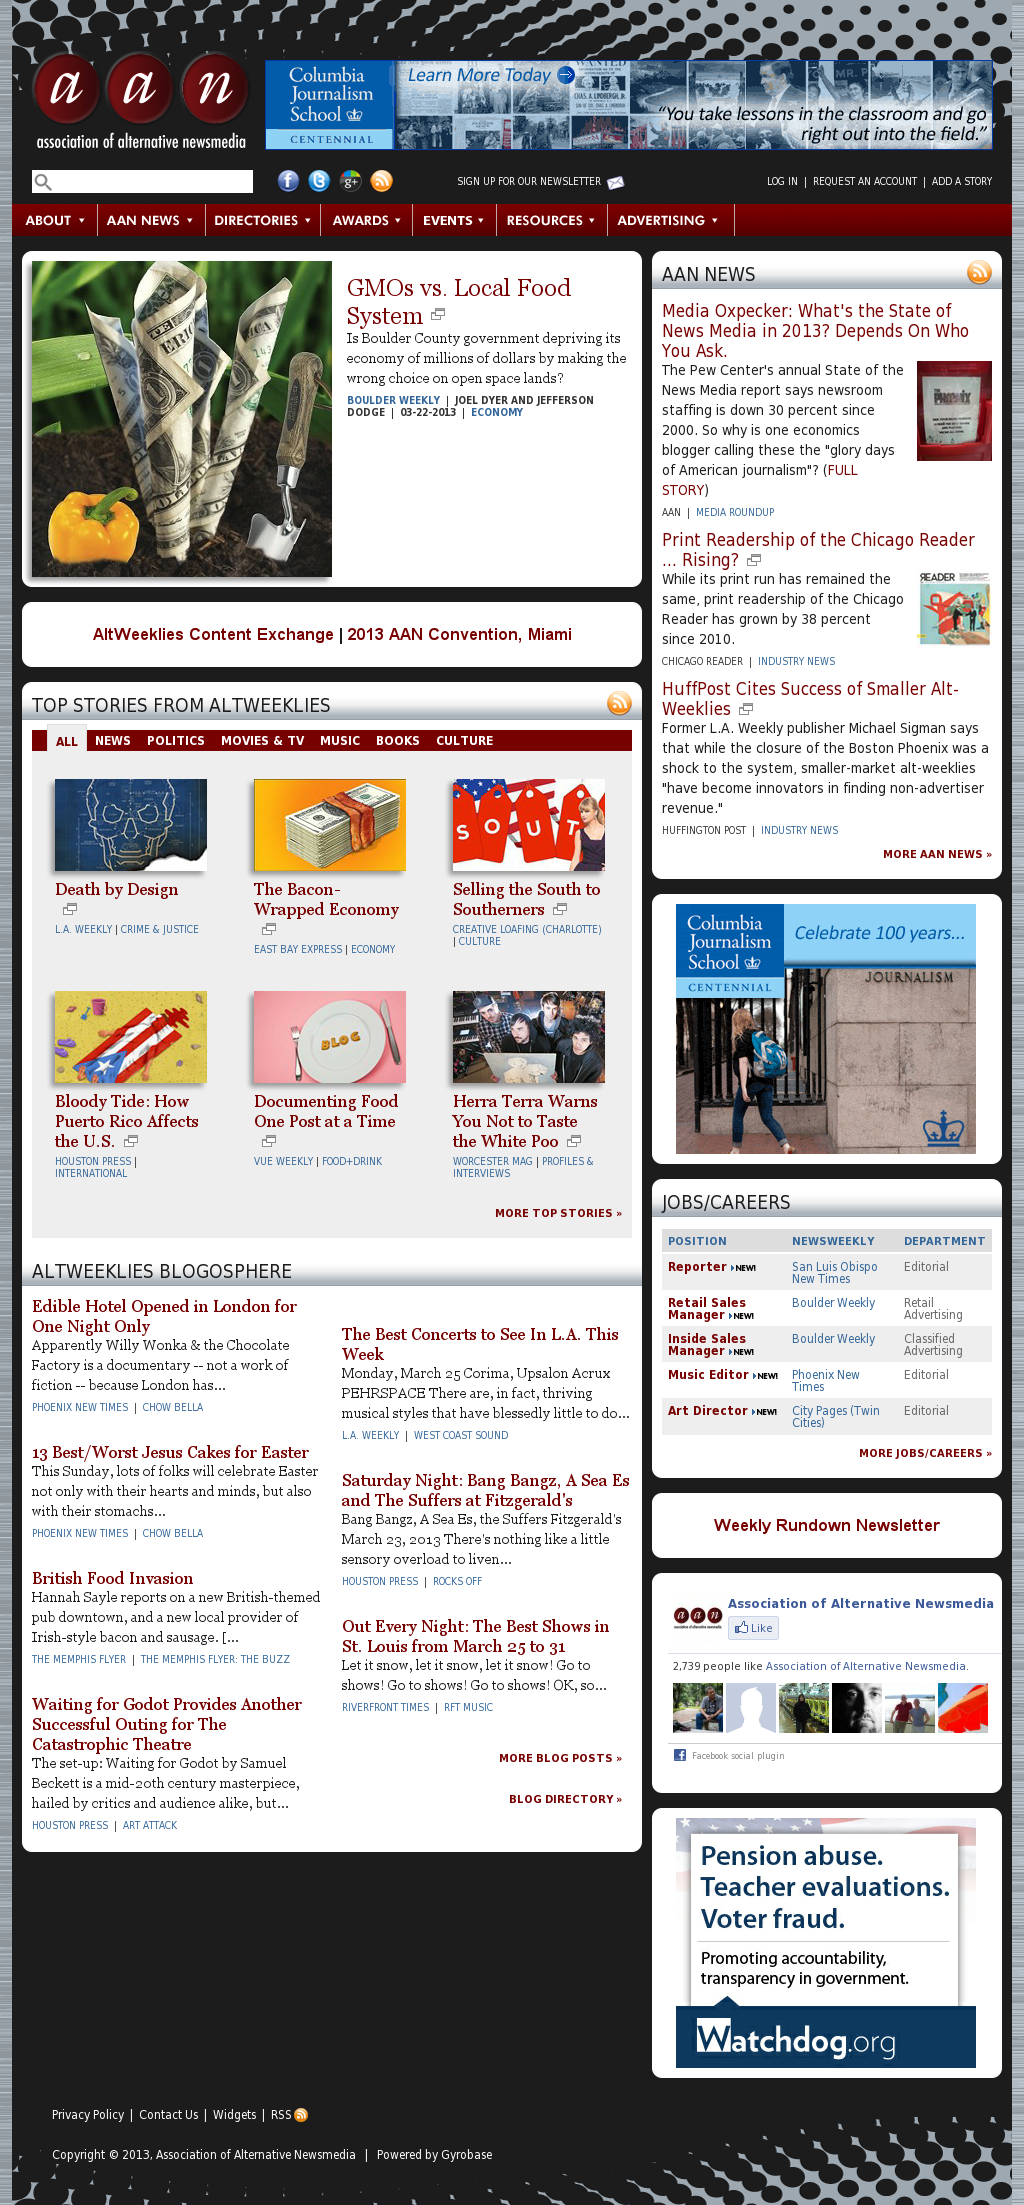 Association of Alternative Newsmedia at Monday March 25, 2013, 7:02 p.m. UTC